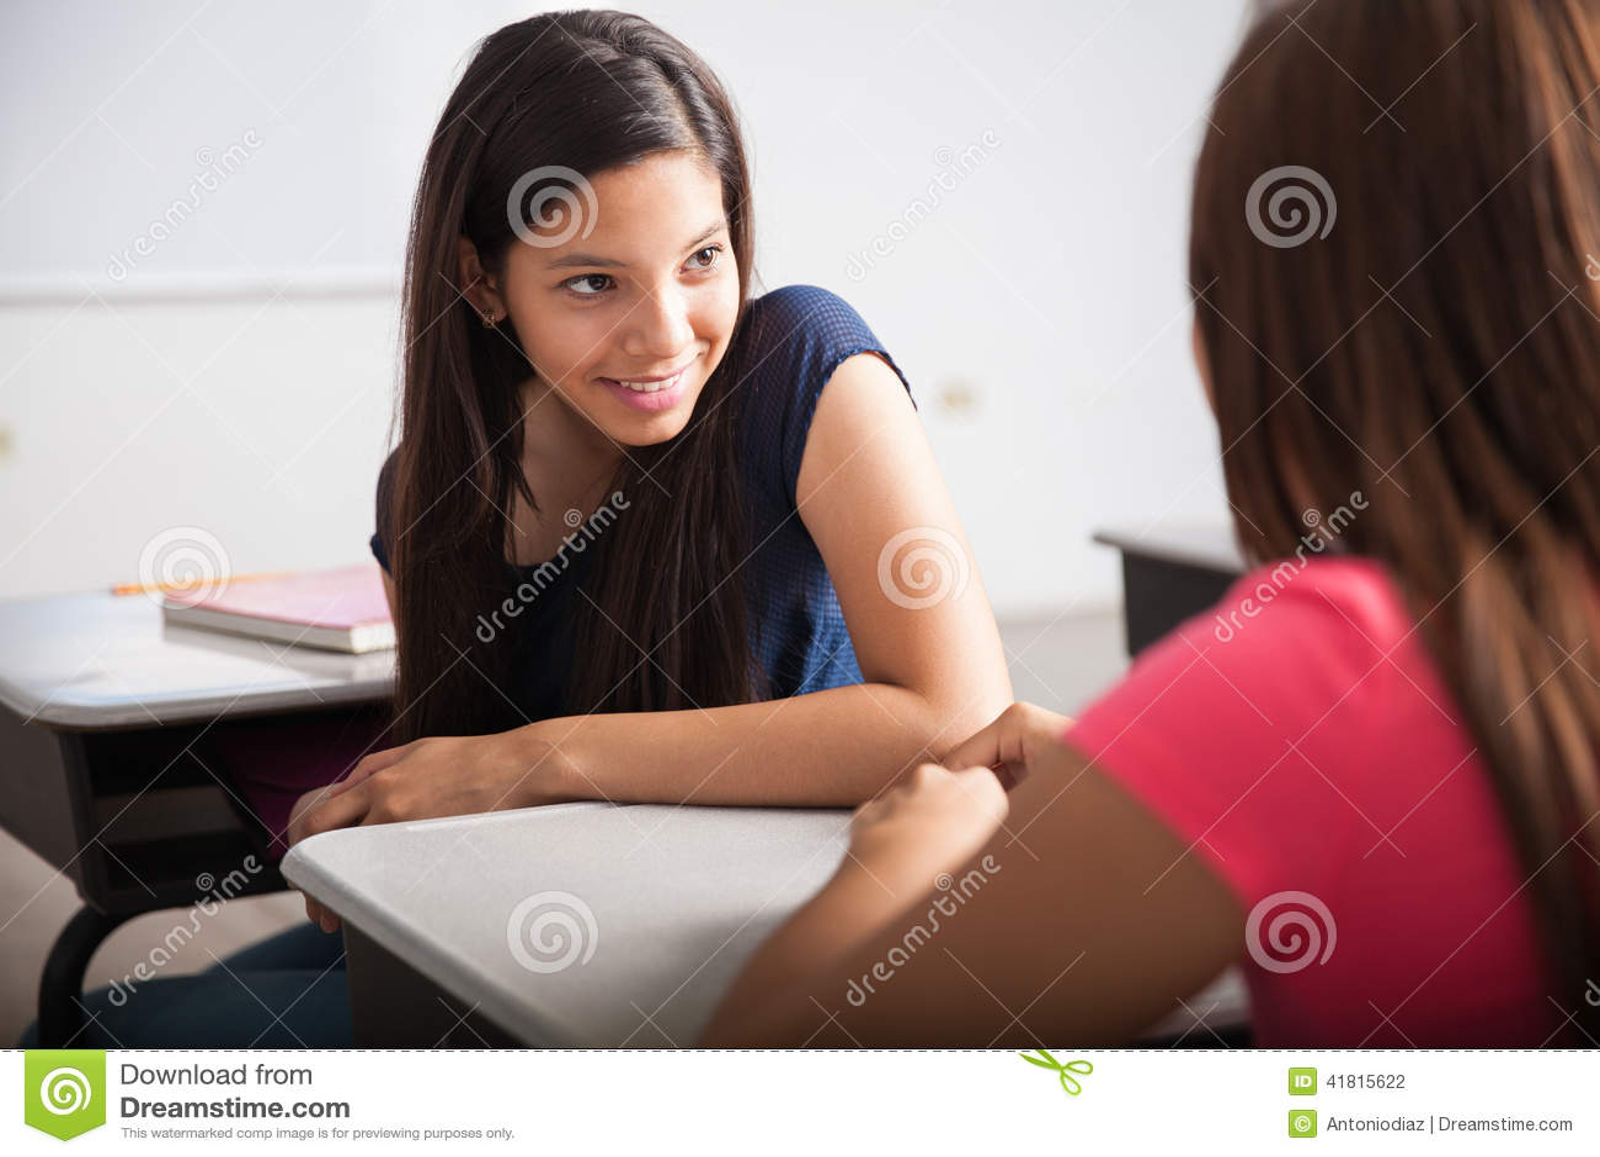 Cute Teens cute teens talking in class stock photo - image: 41815622